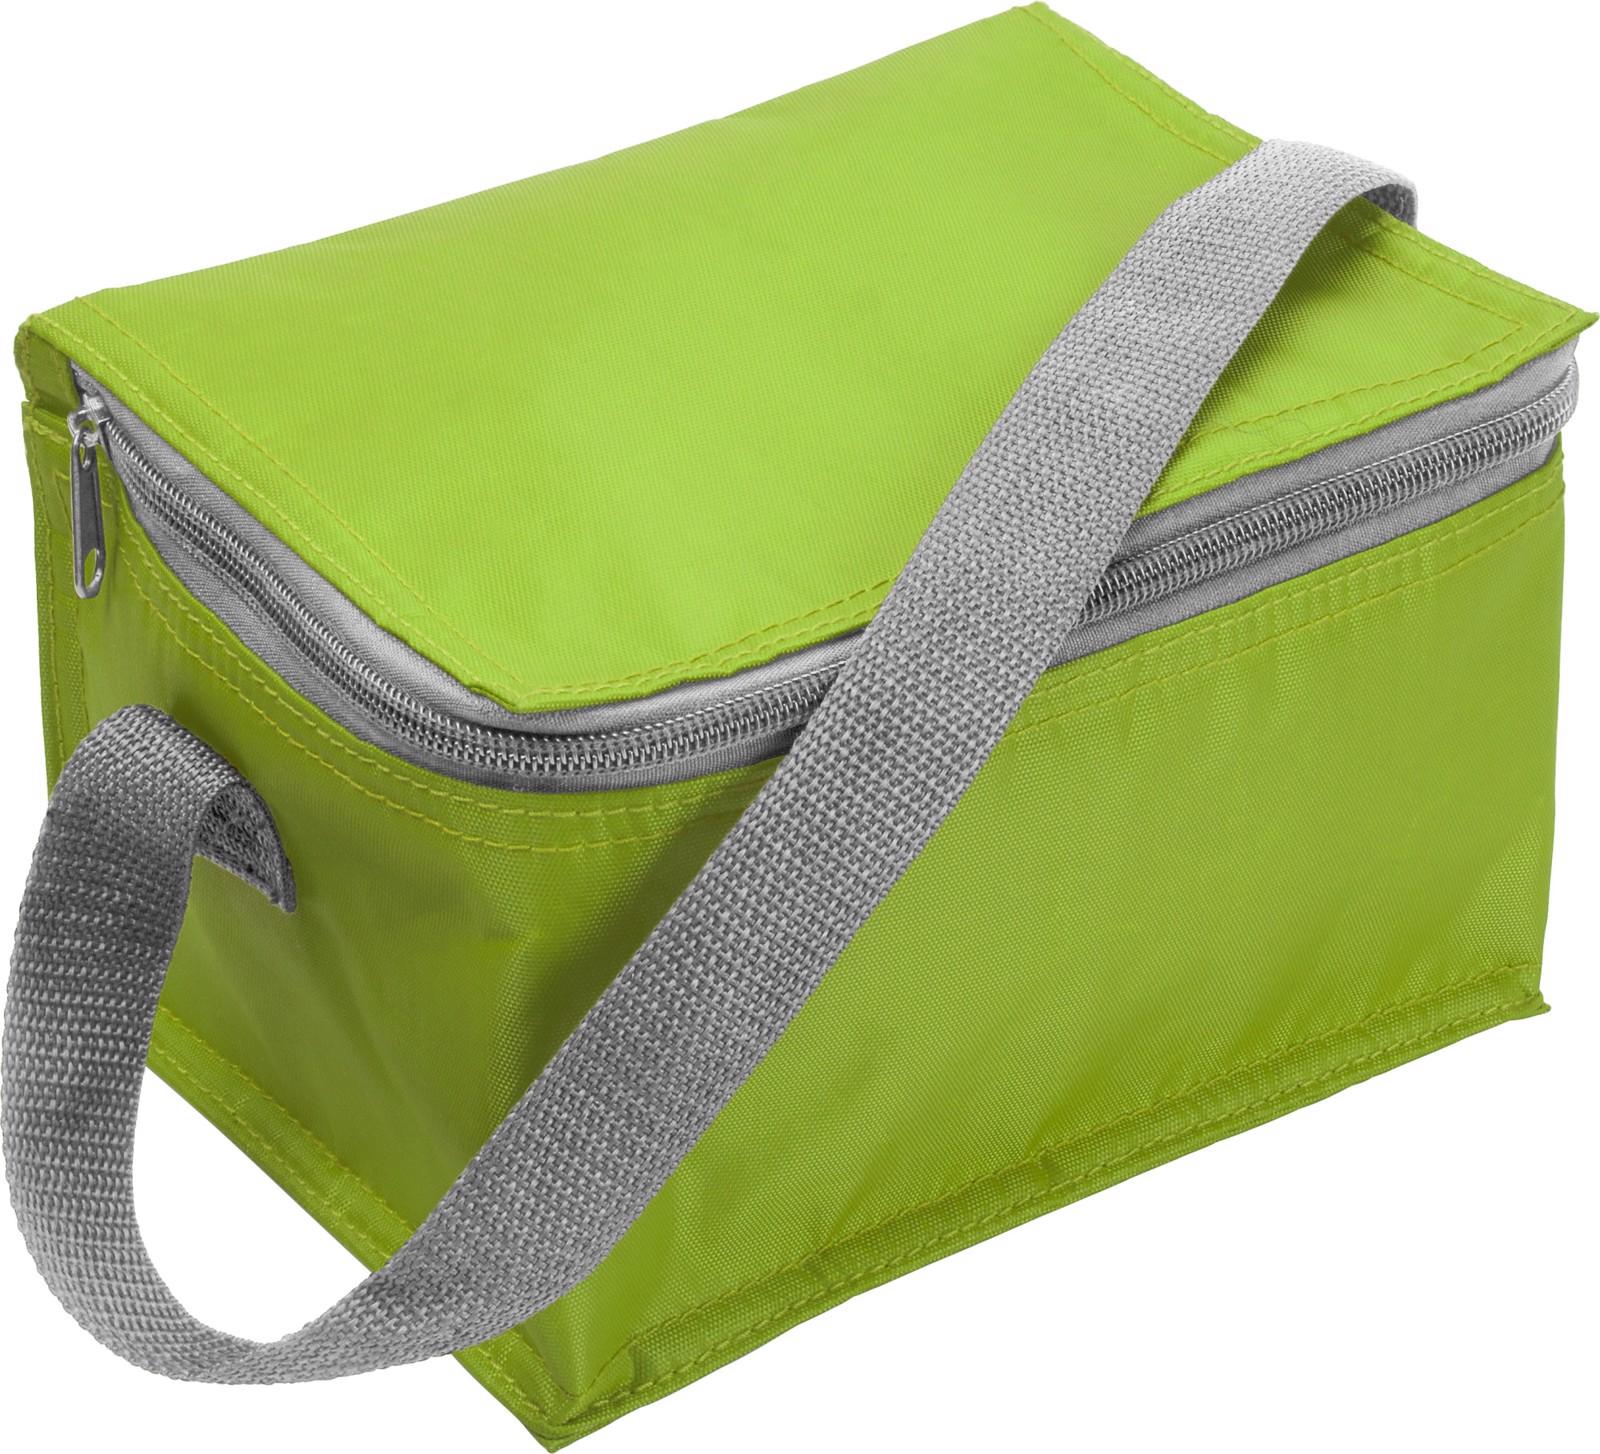 Polyester (420D) cooler bag - Light Green